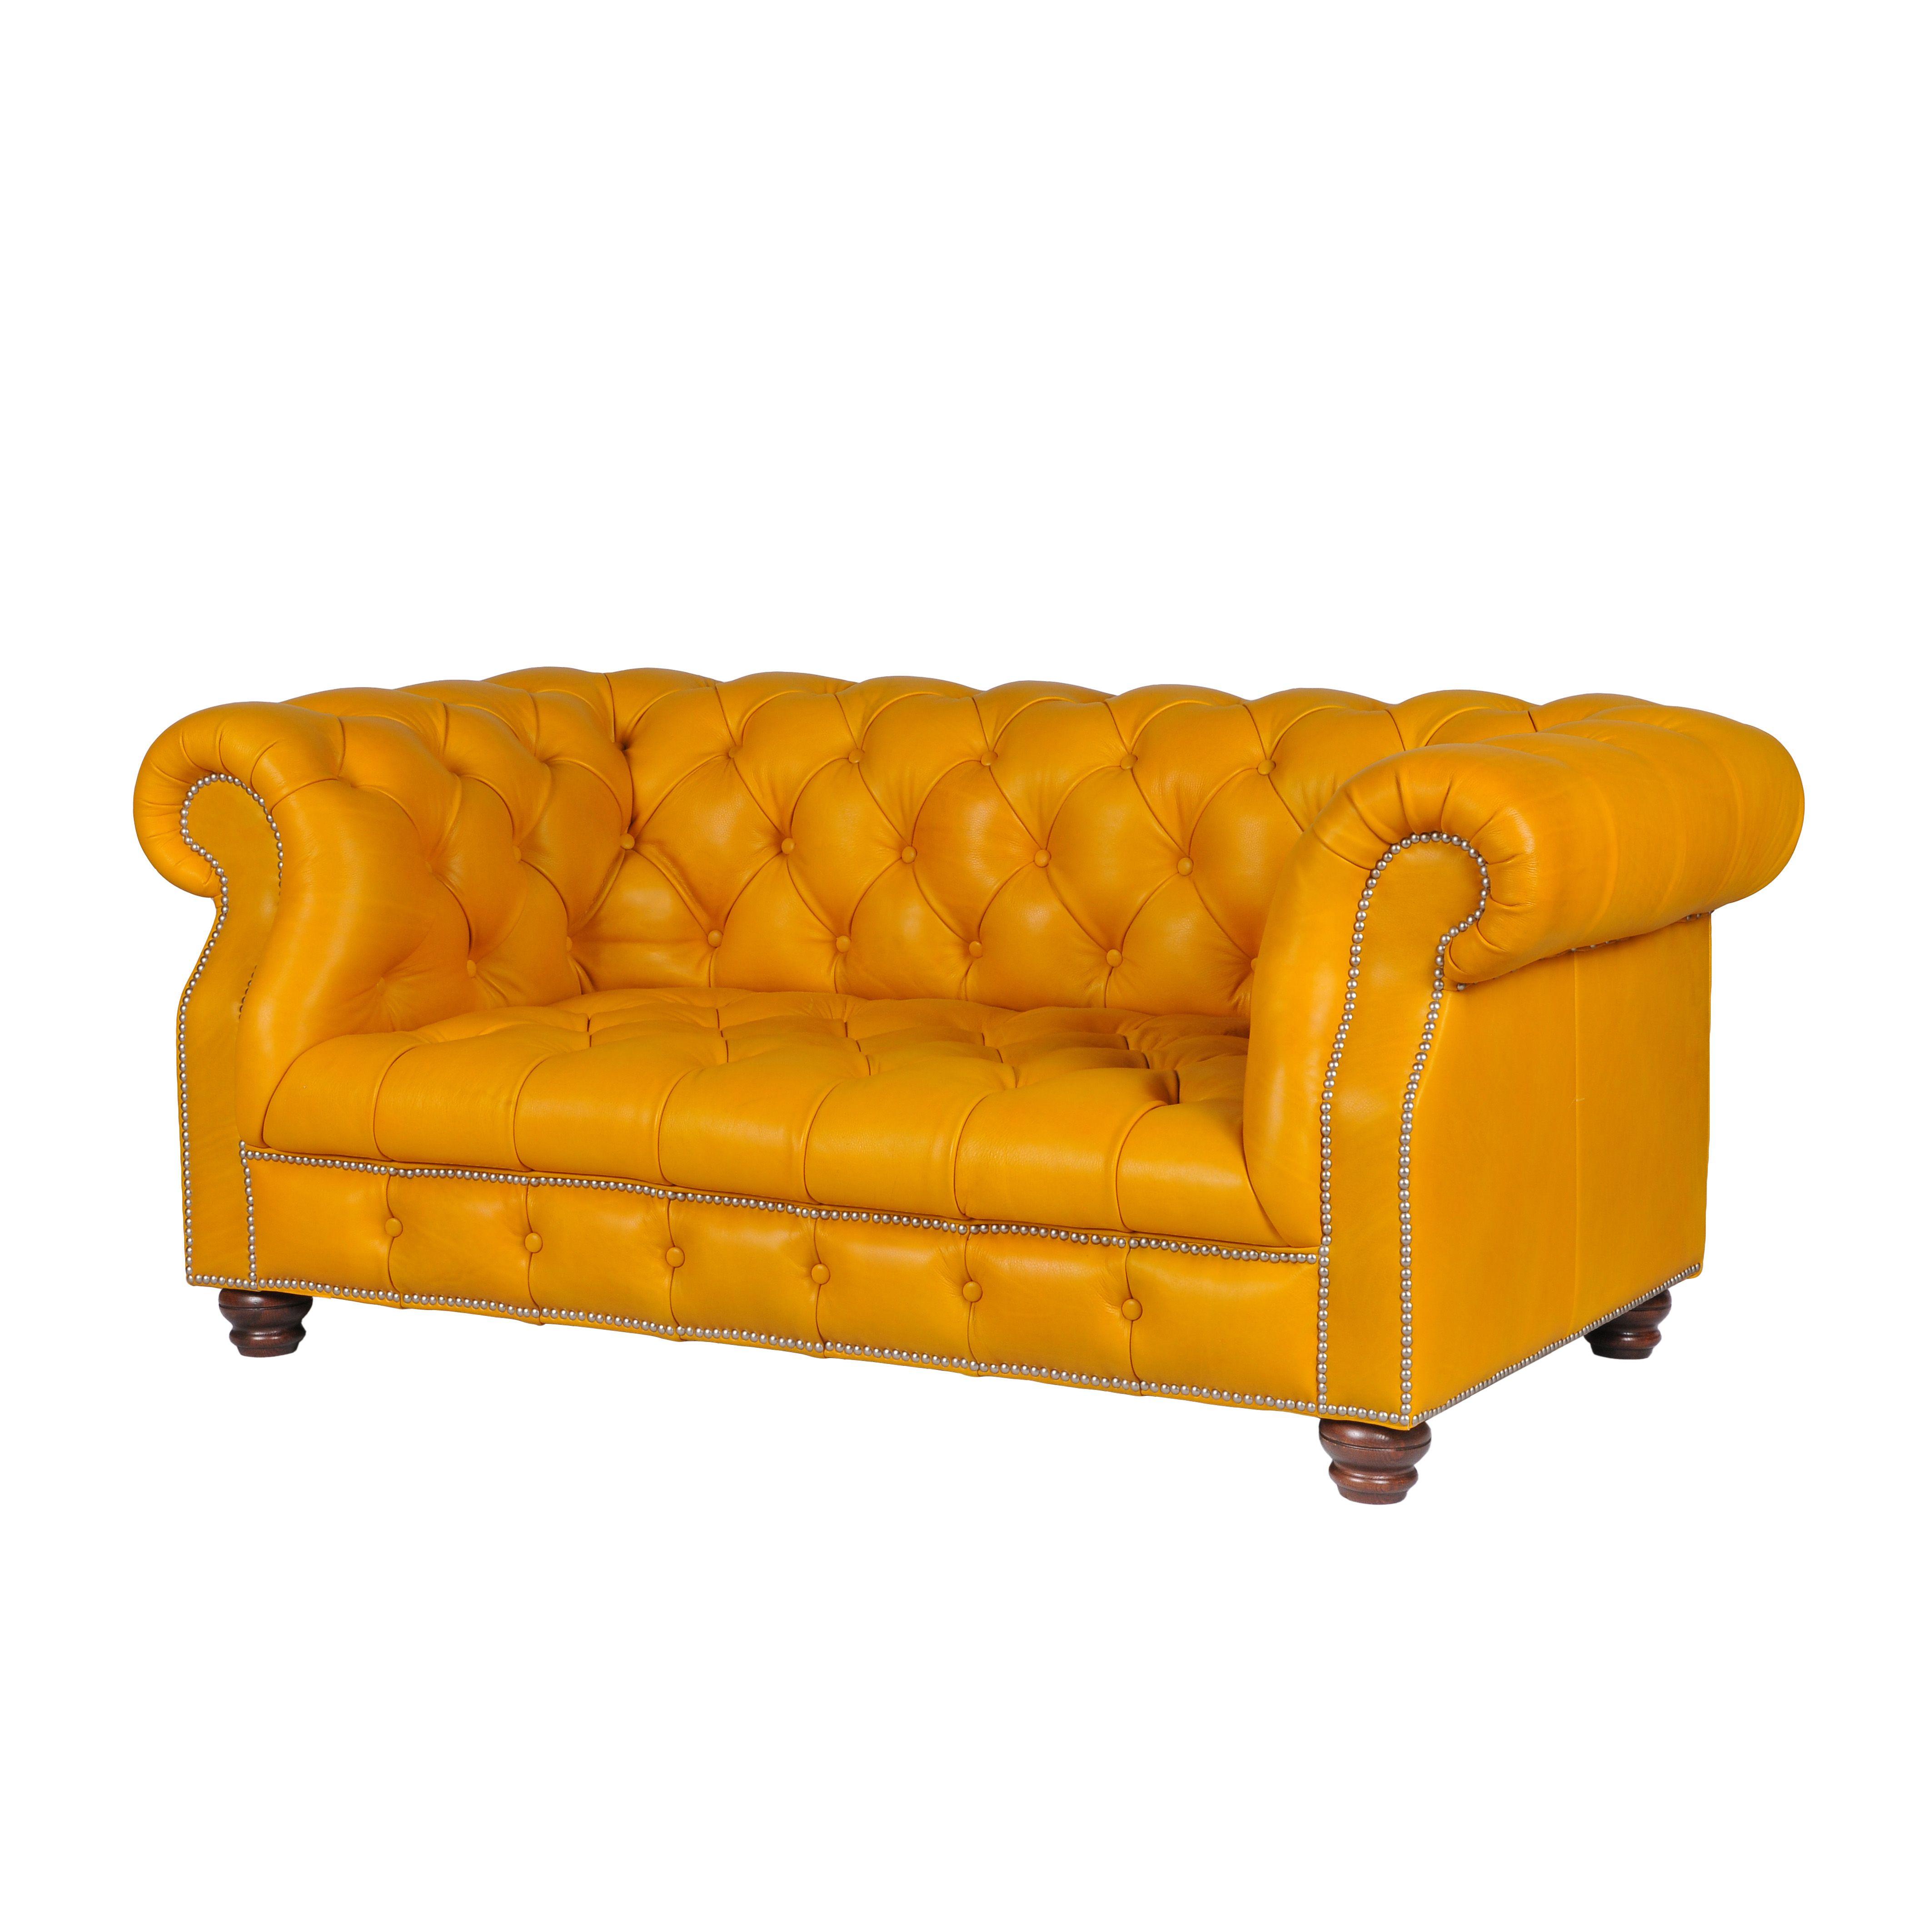 Senior Common Room Sofa